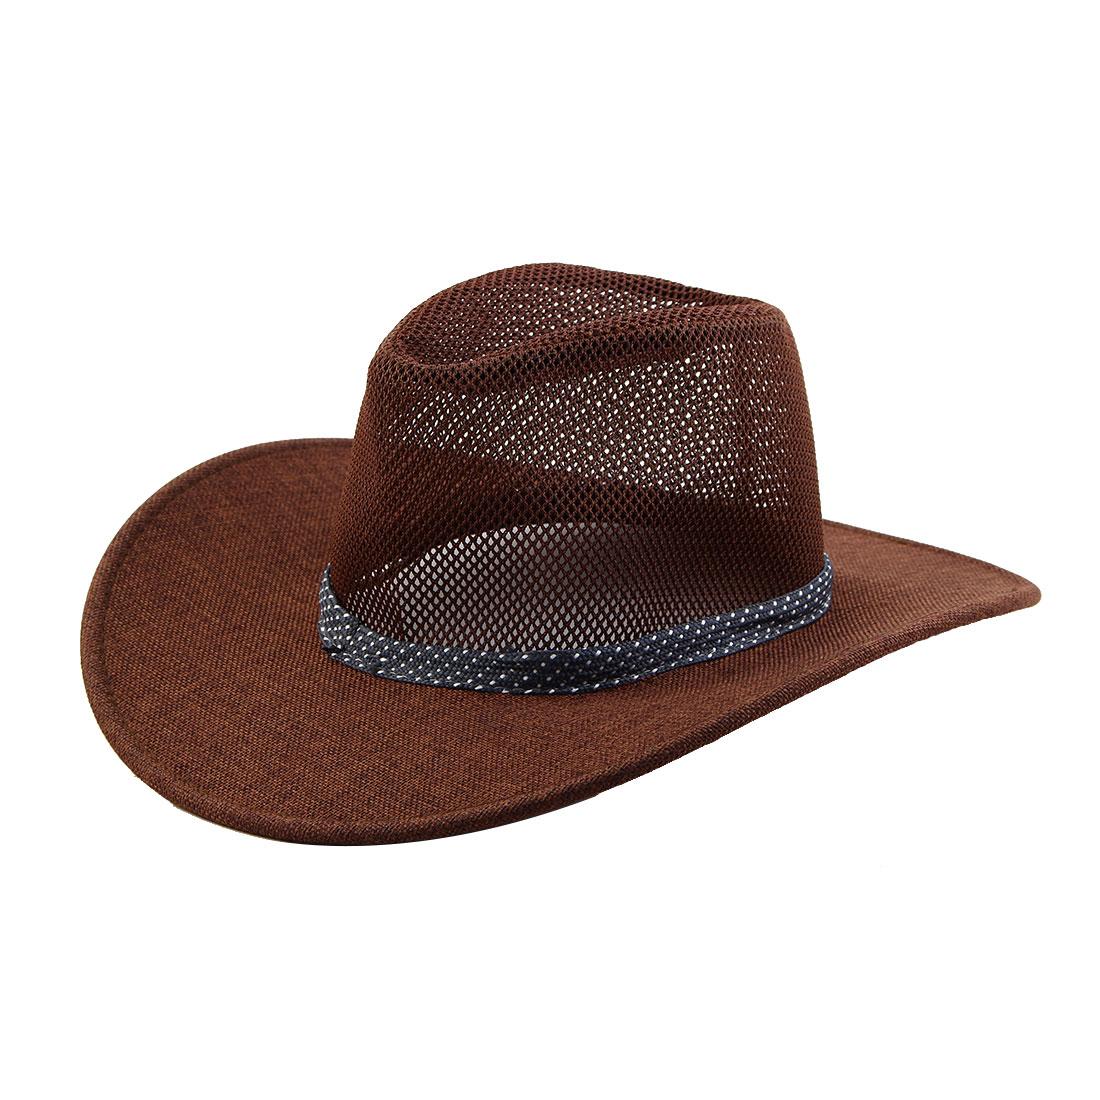 Linen Wide Brim Western Style Beach Mesh Cap Net Sunhat Cowboy Hat Coffee Color